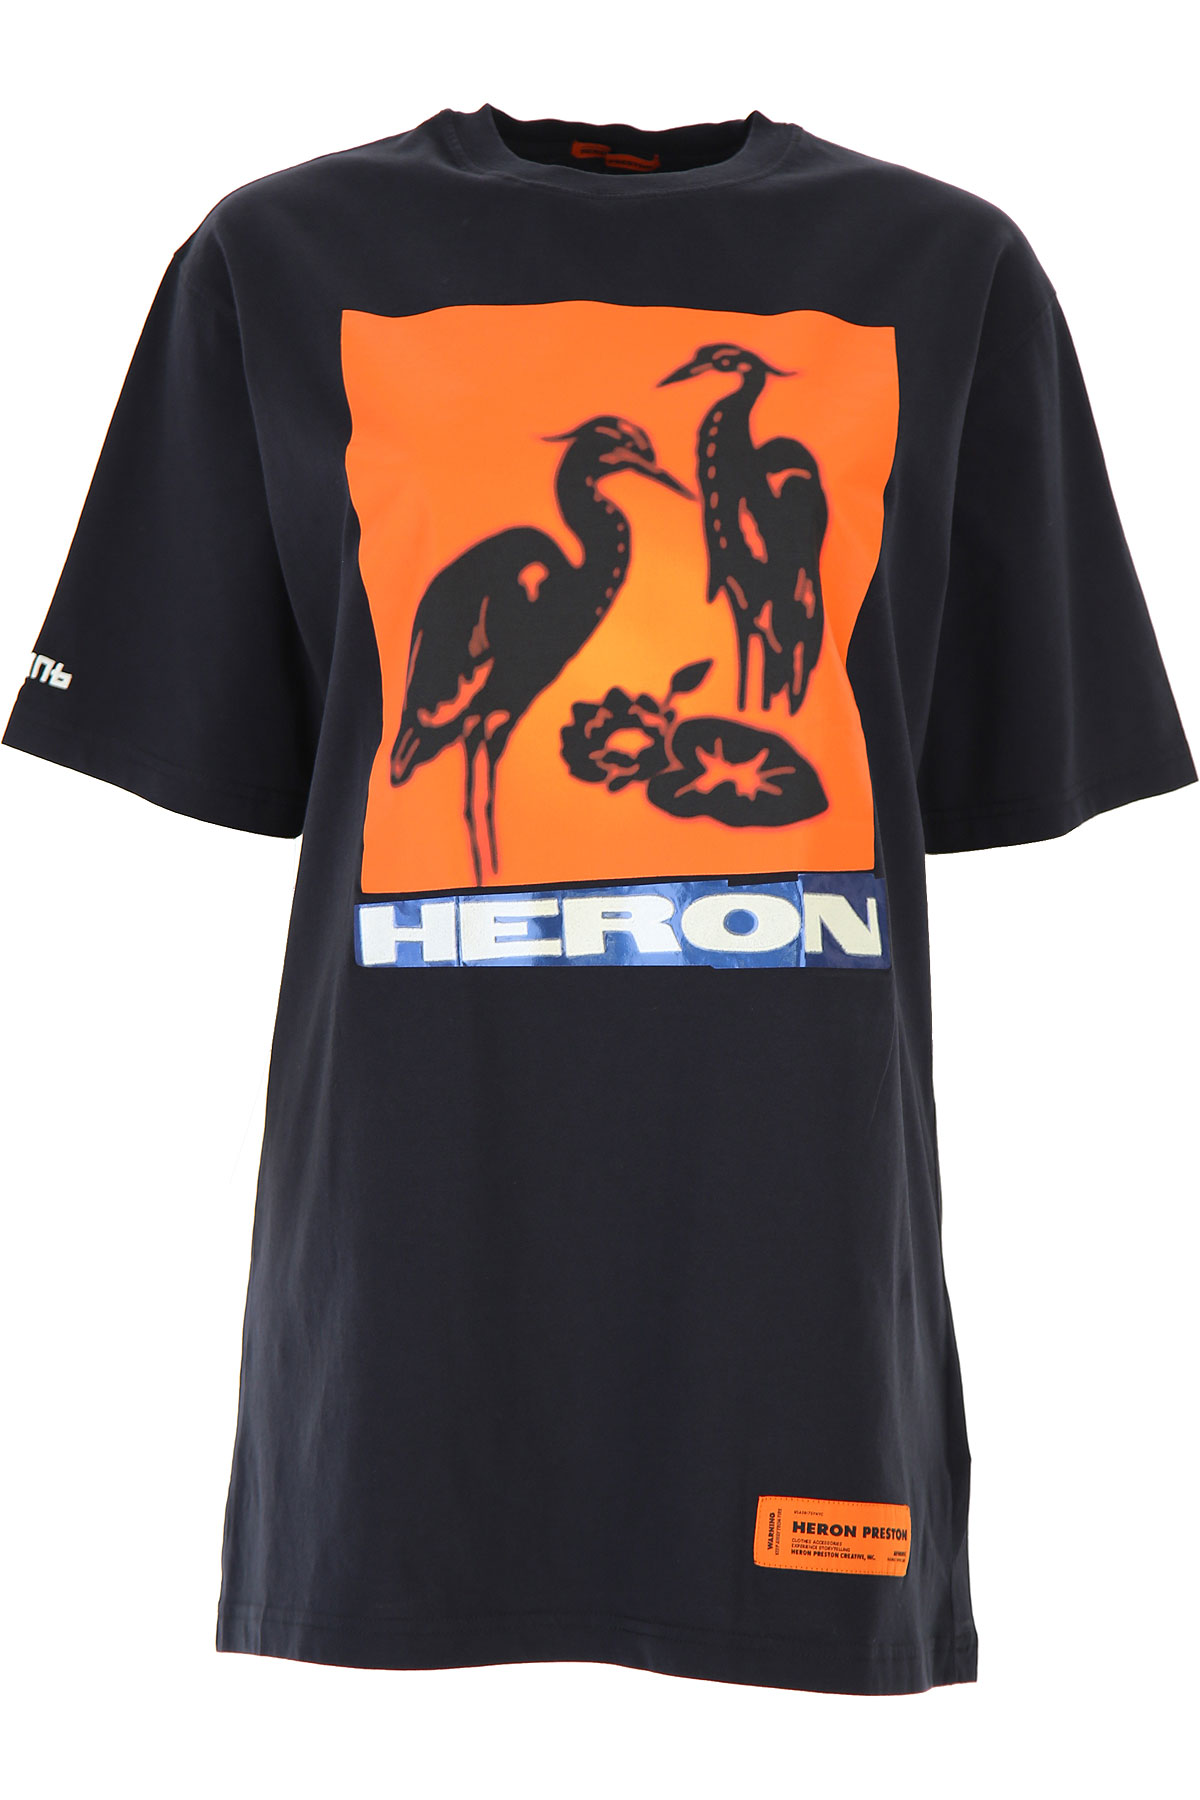 Heron Preston T-Shirt for Women On Sale, Black, Cotton, 2019, 2 4 6 8